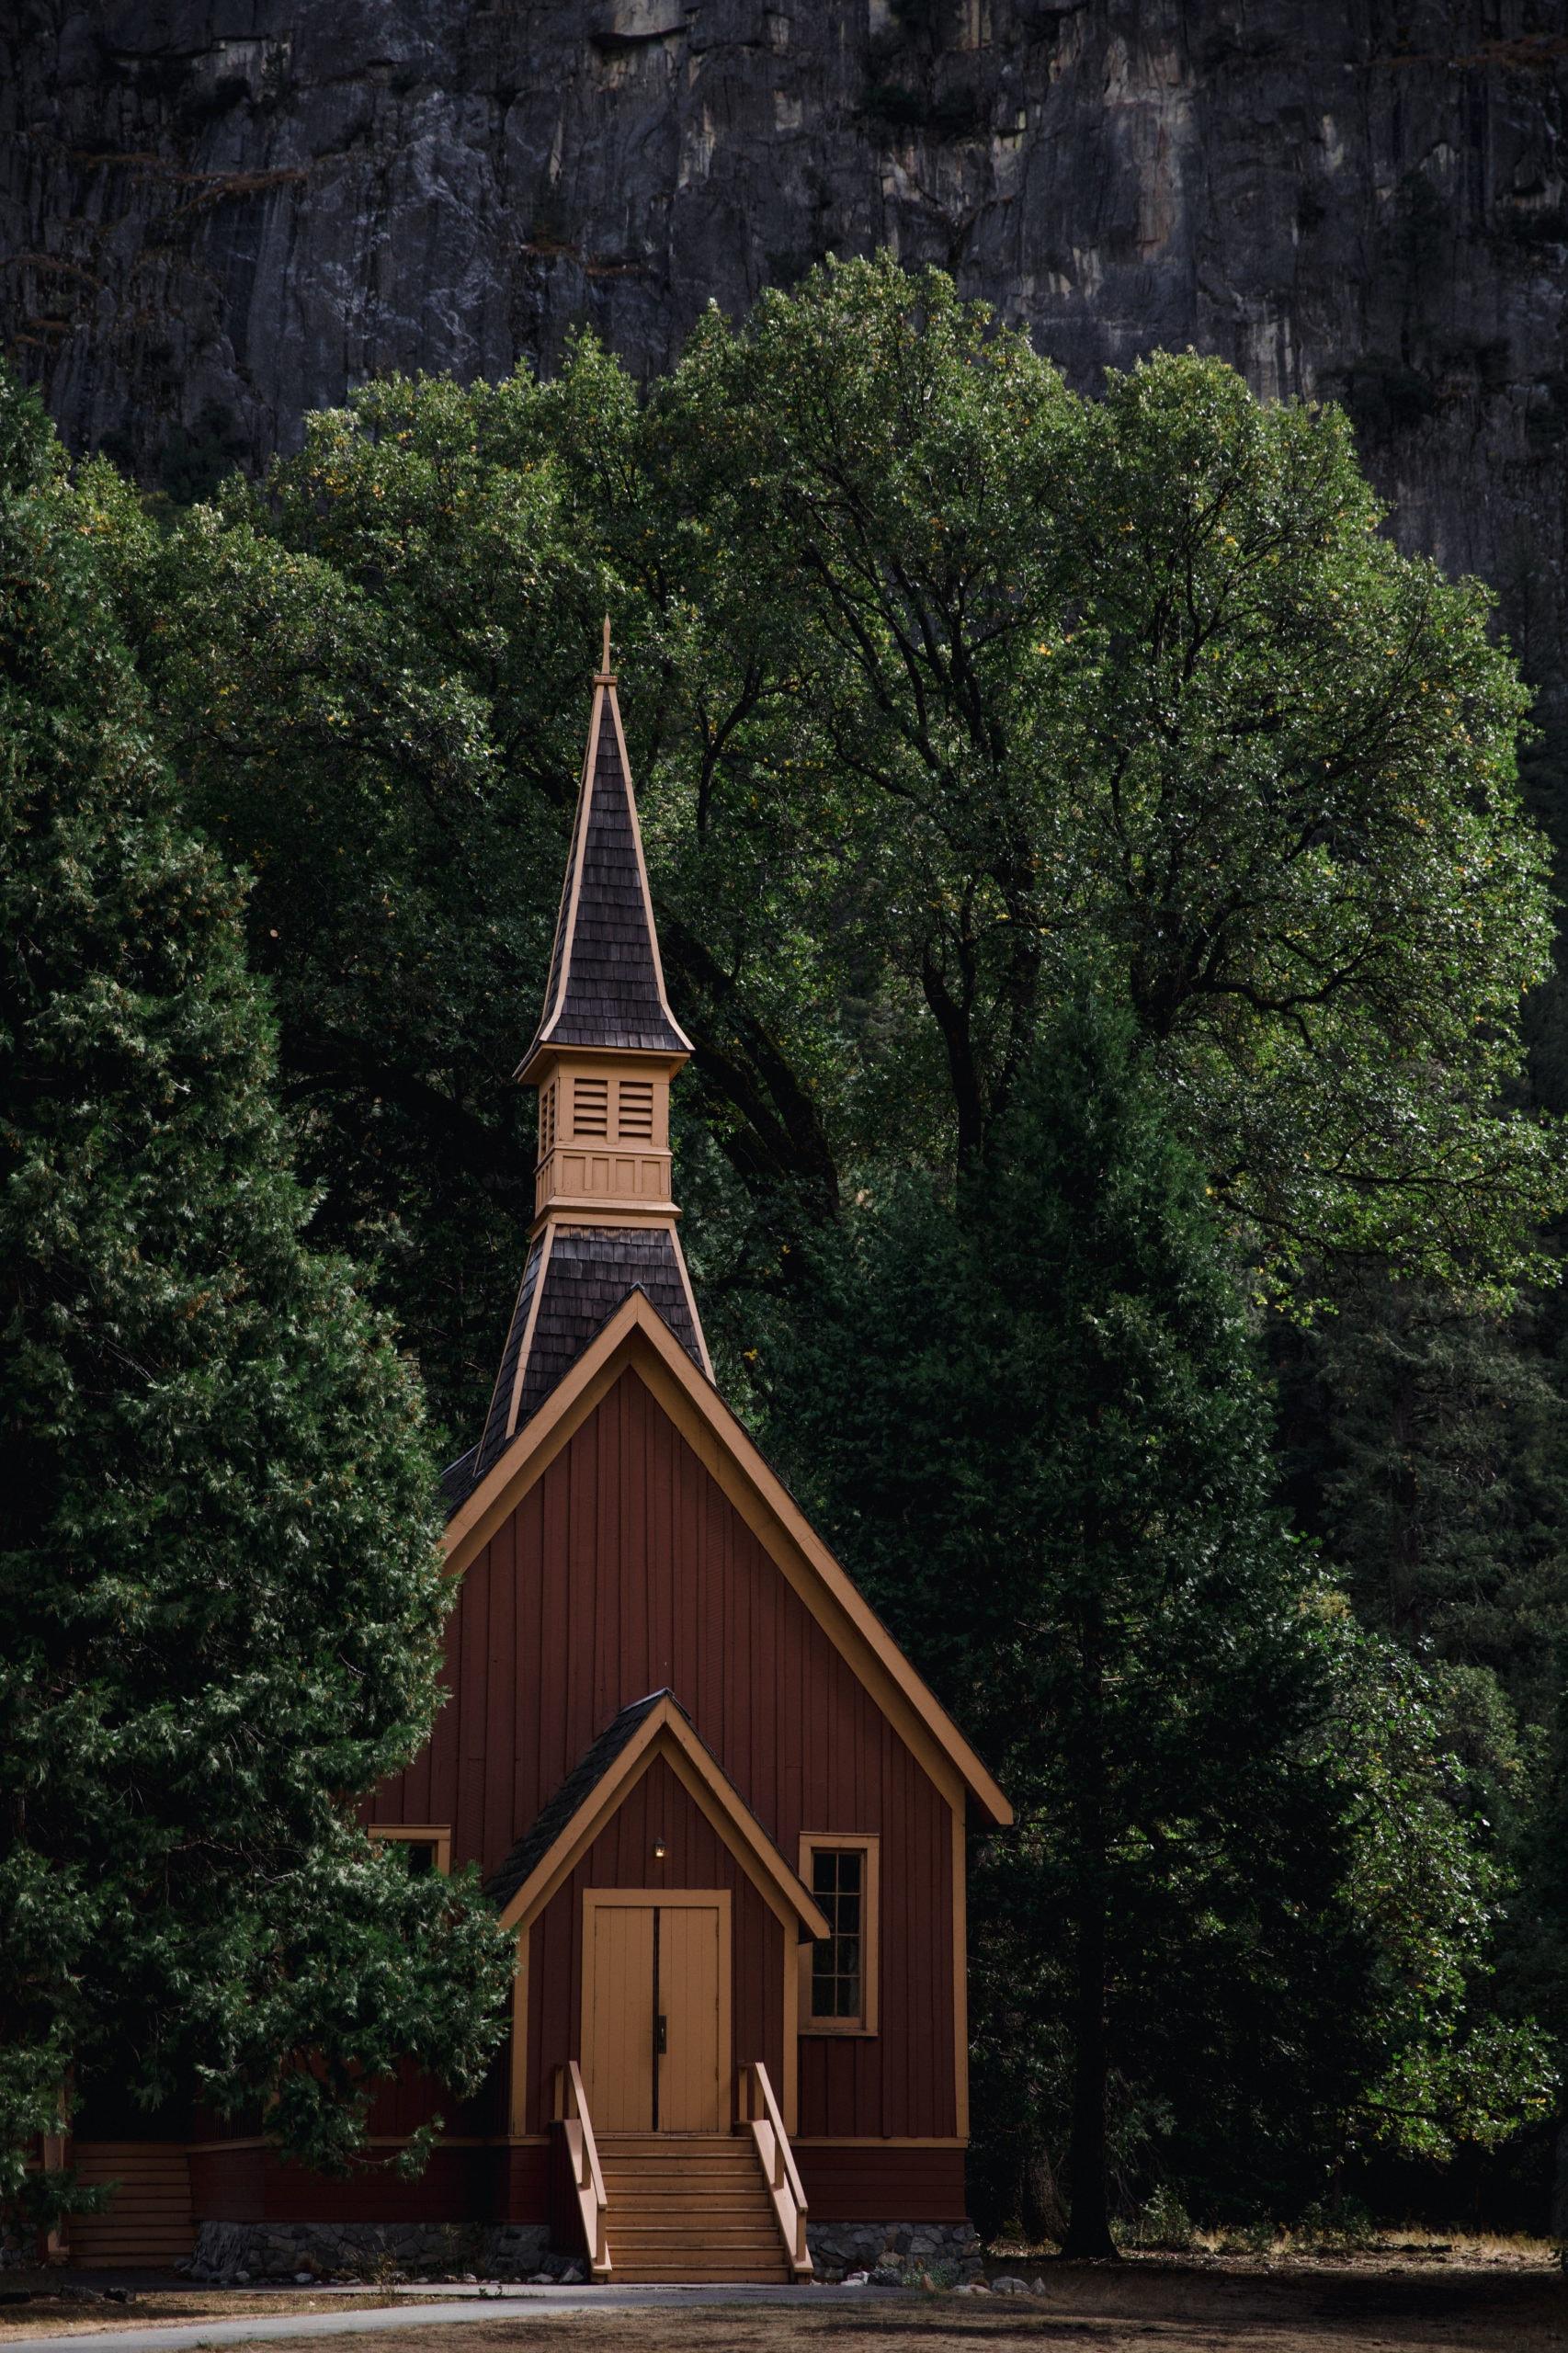 Yosemite Wedding Chapel in the meadow of Yosemite National Park